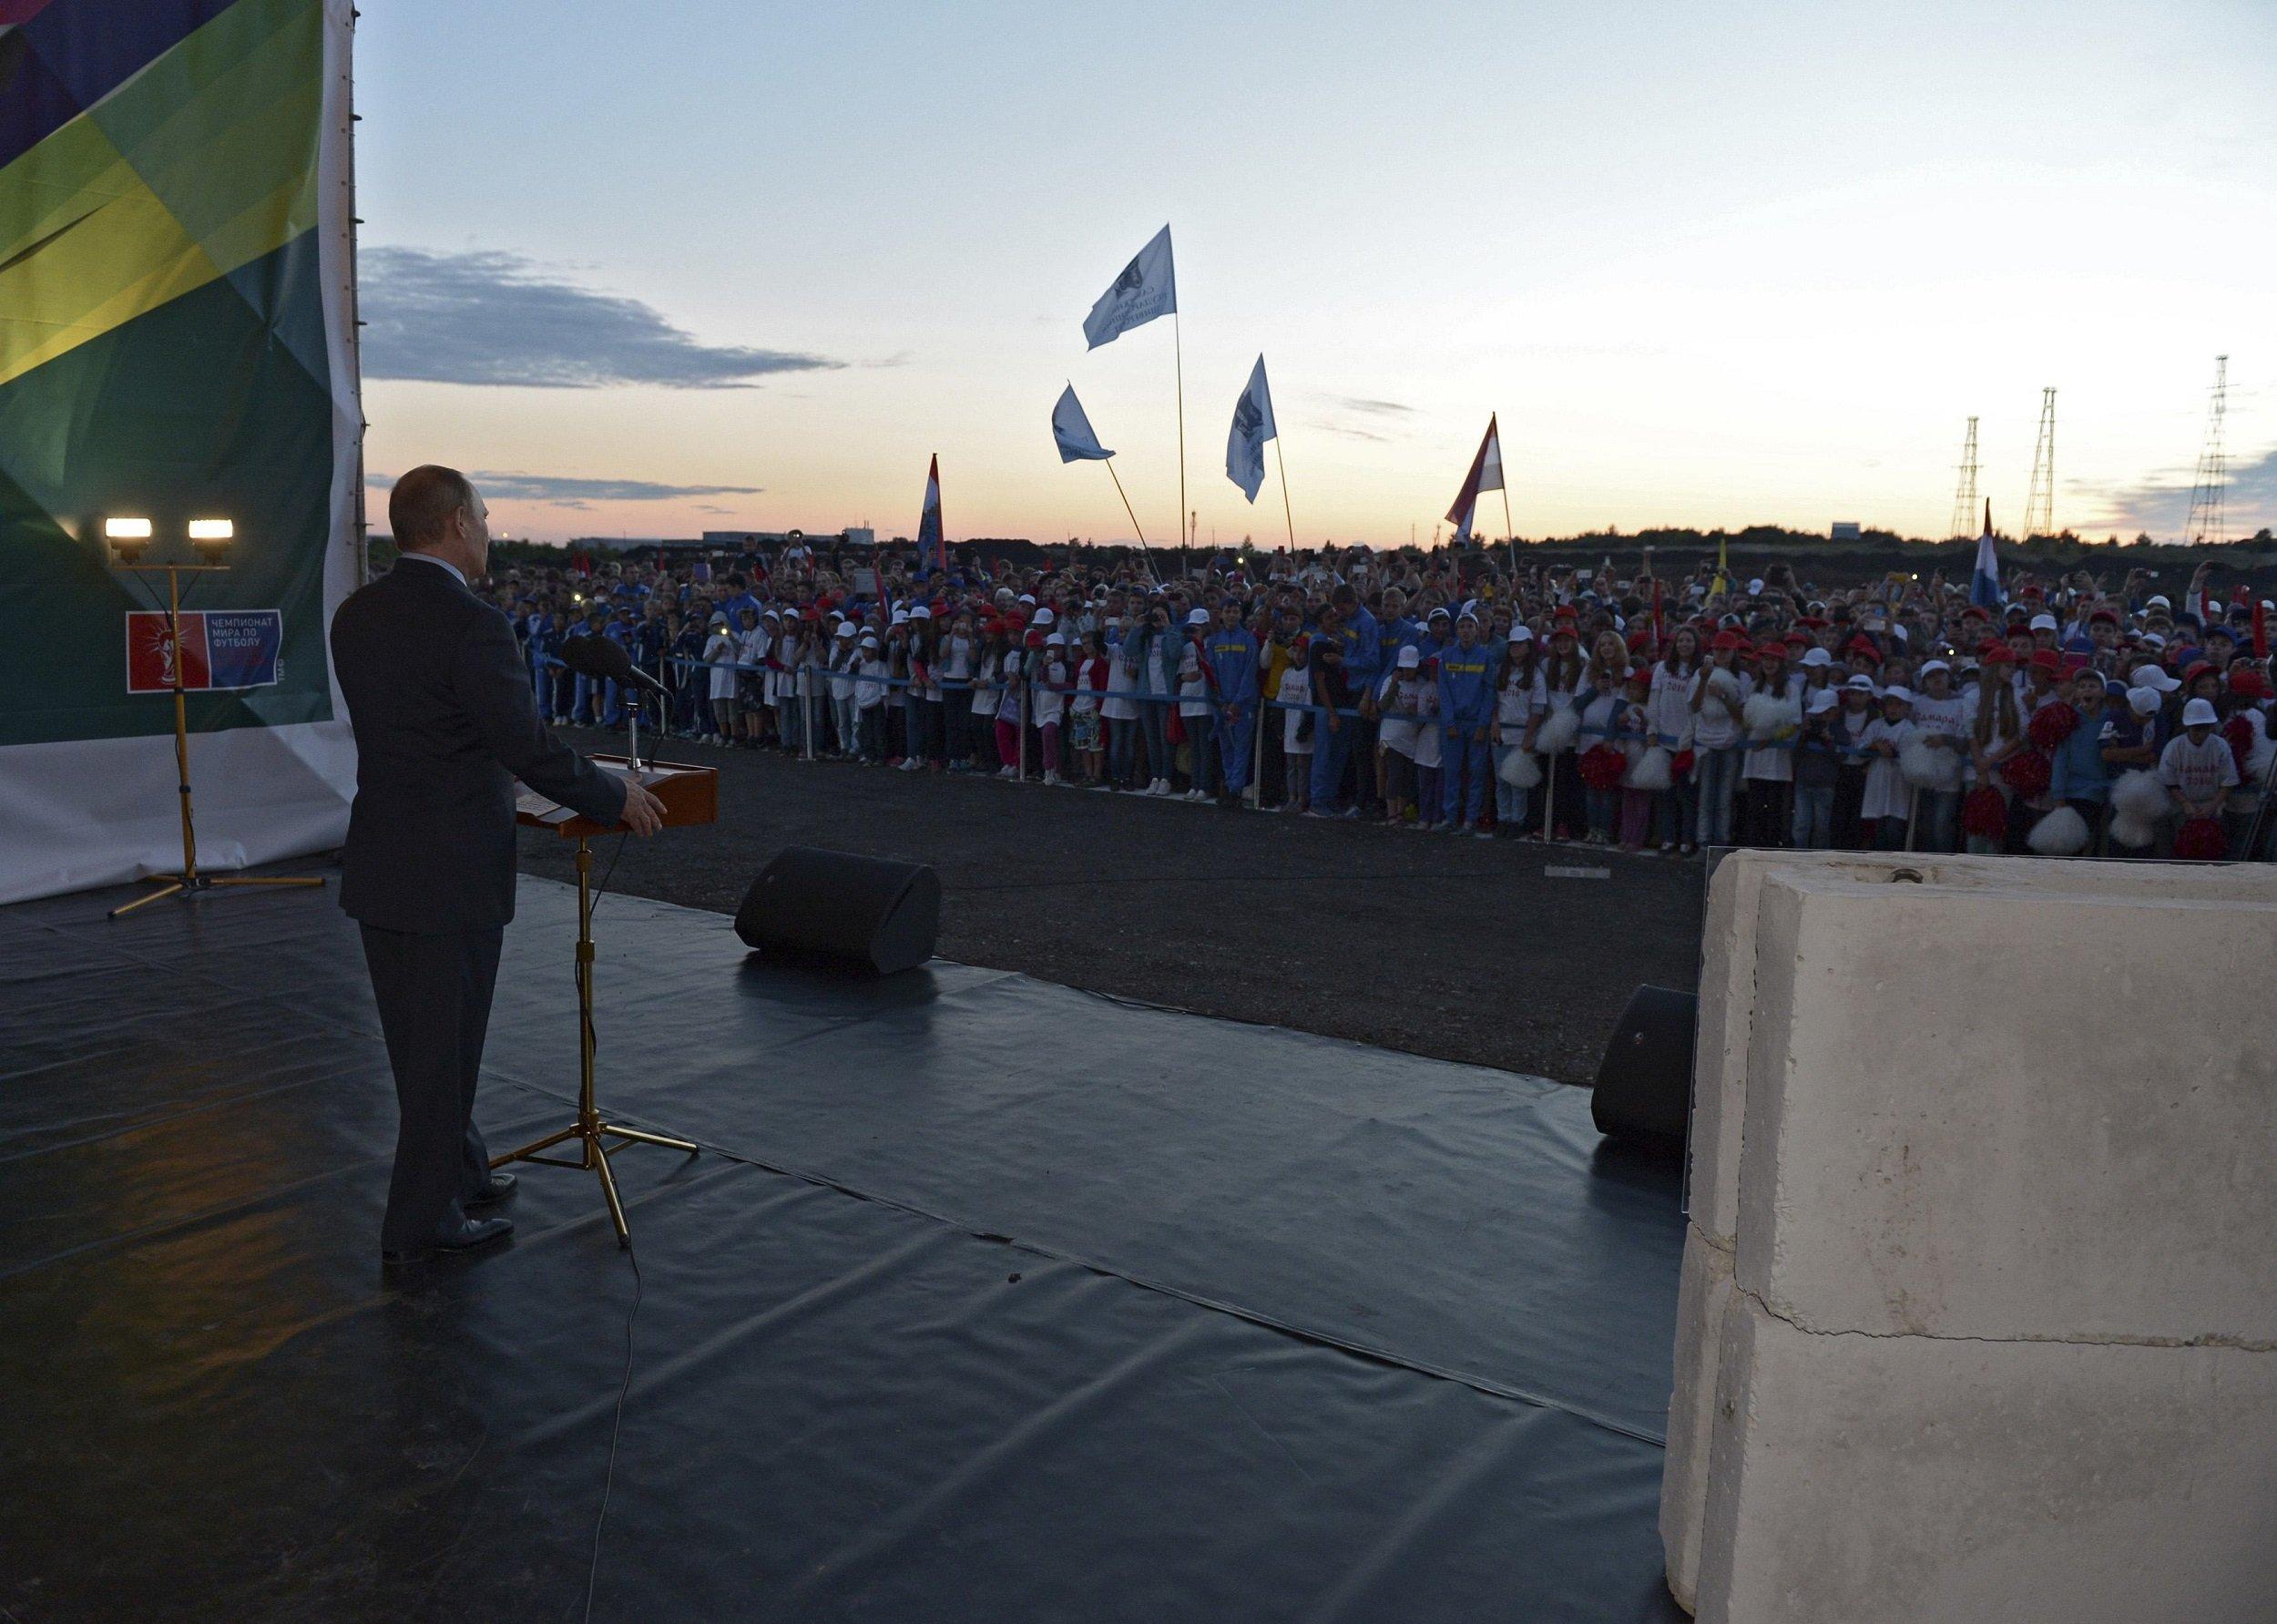 2014-07-21T201528Z_1797934018_GM1EA7M0BPZ01_RTRMADP_3_SOCCER-WORLD-RUSSIA-2018